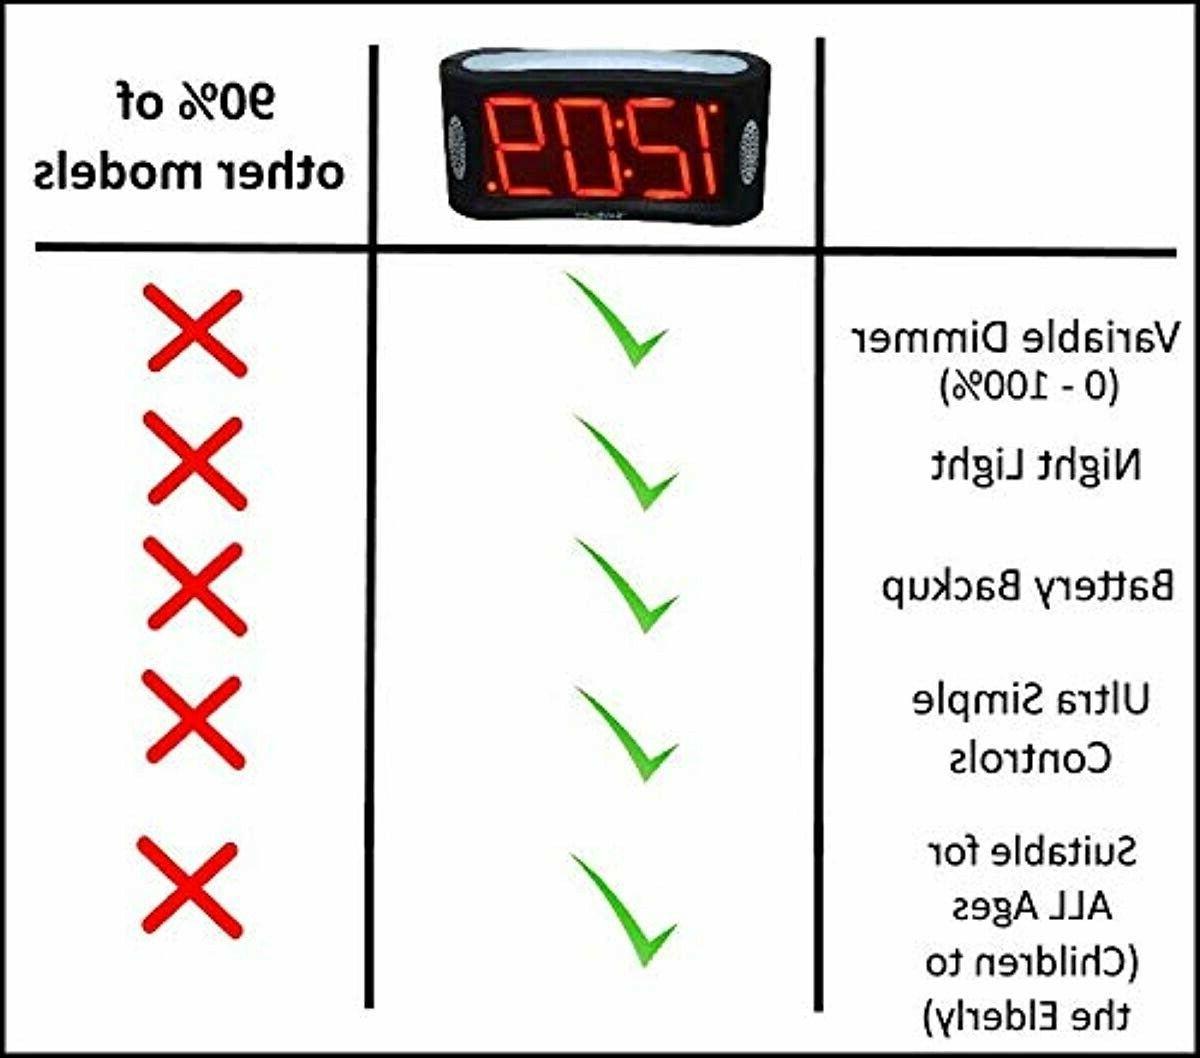 Travelwey LED Alarm Outlet Operat